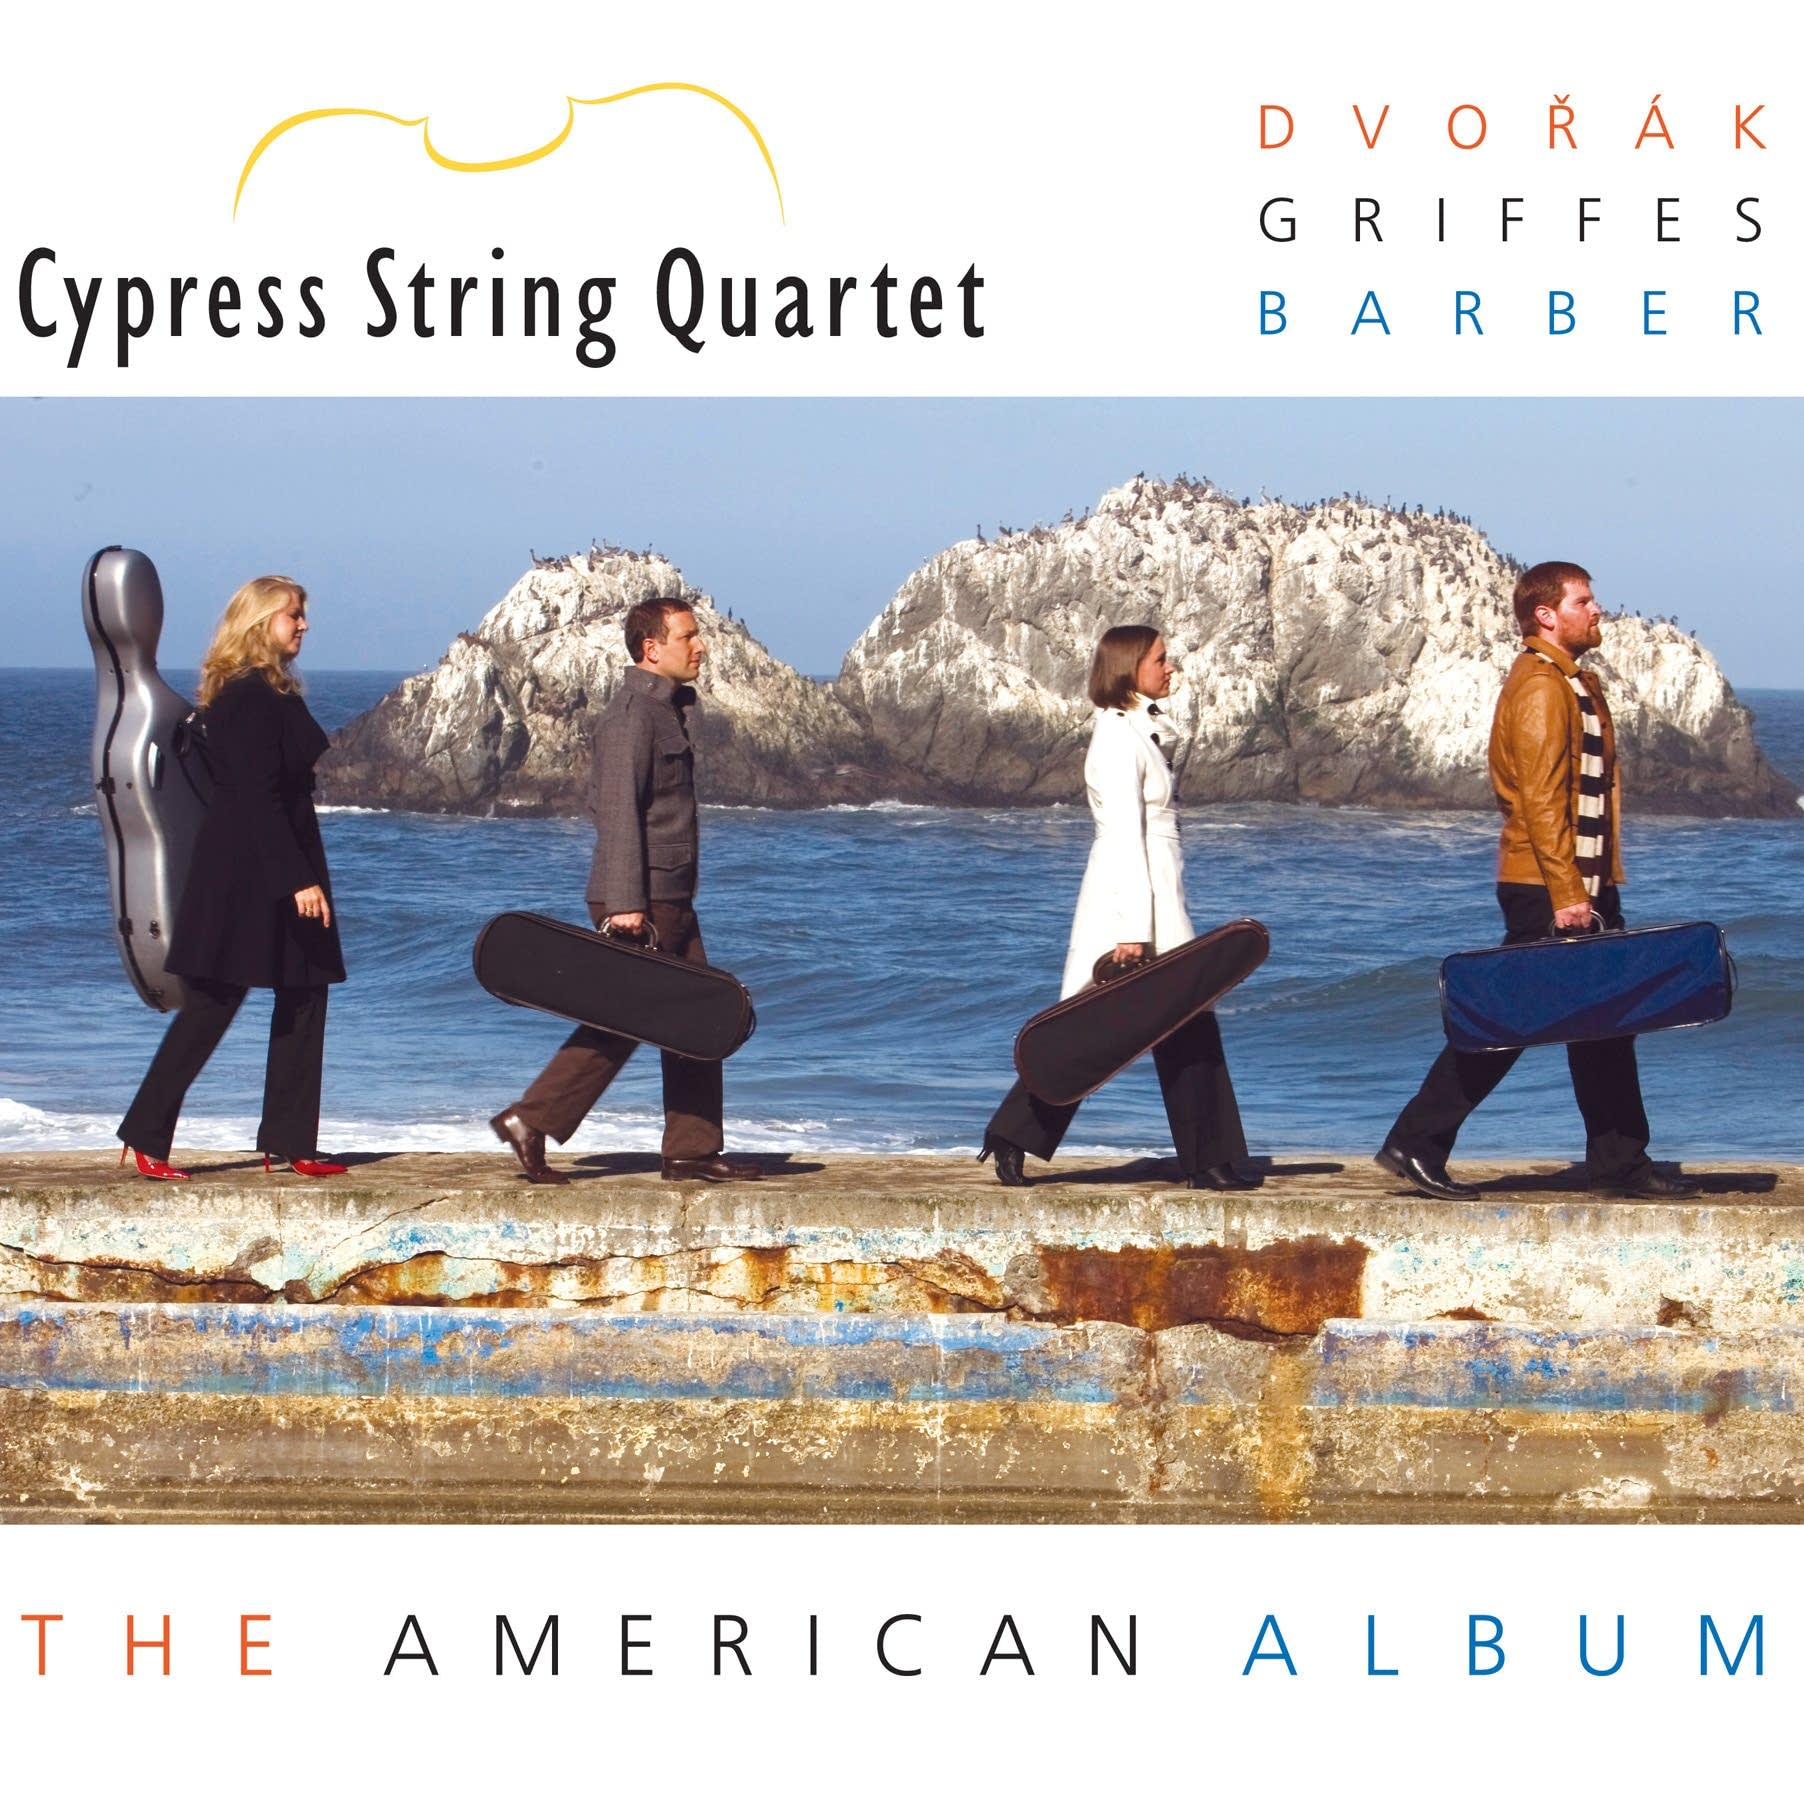 Cypress String Quartet, The American Album